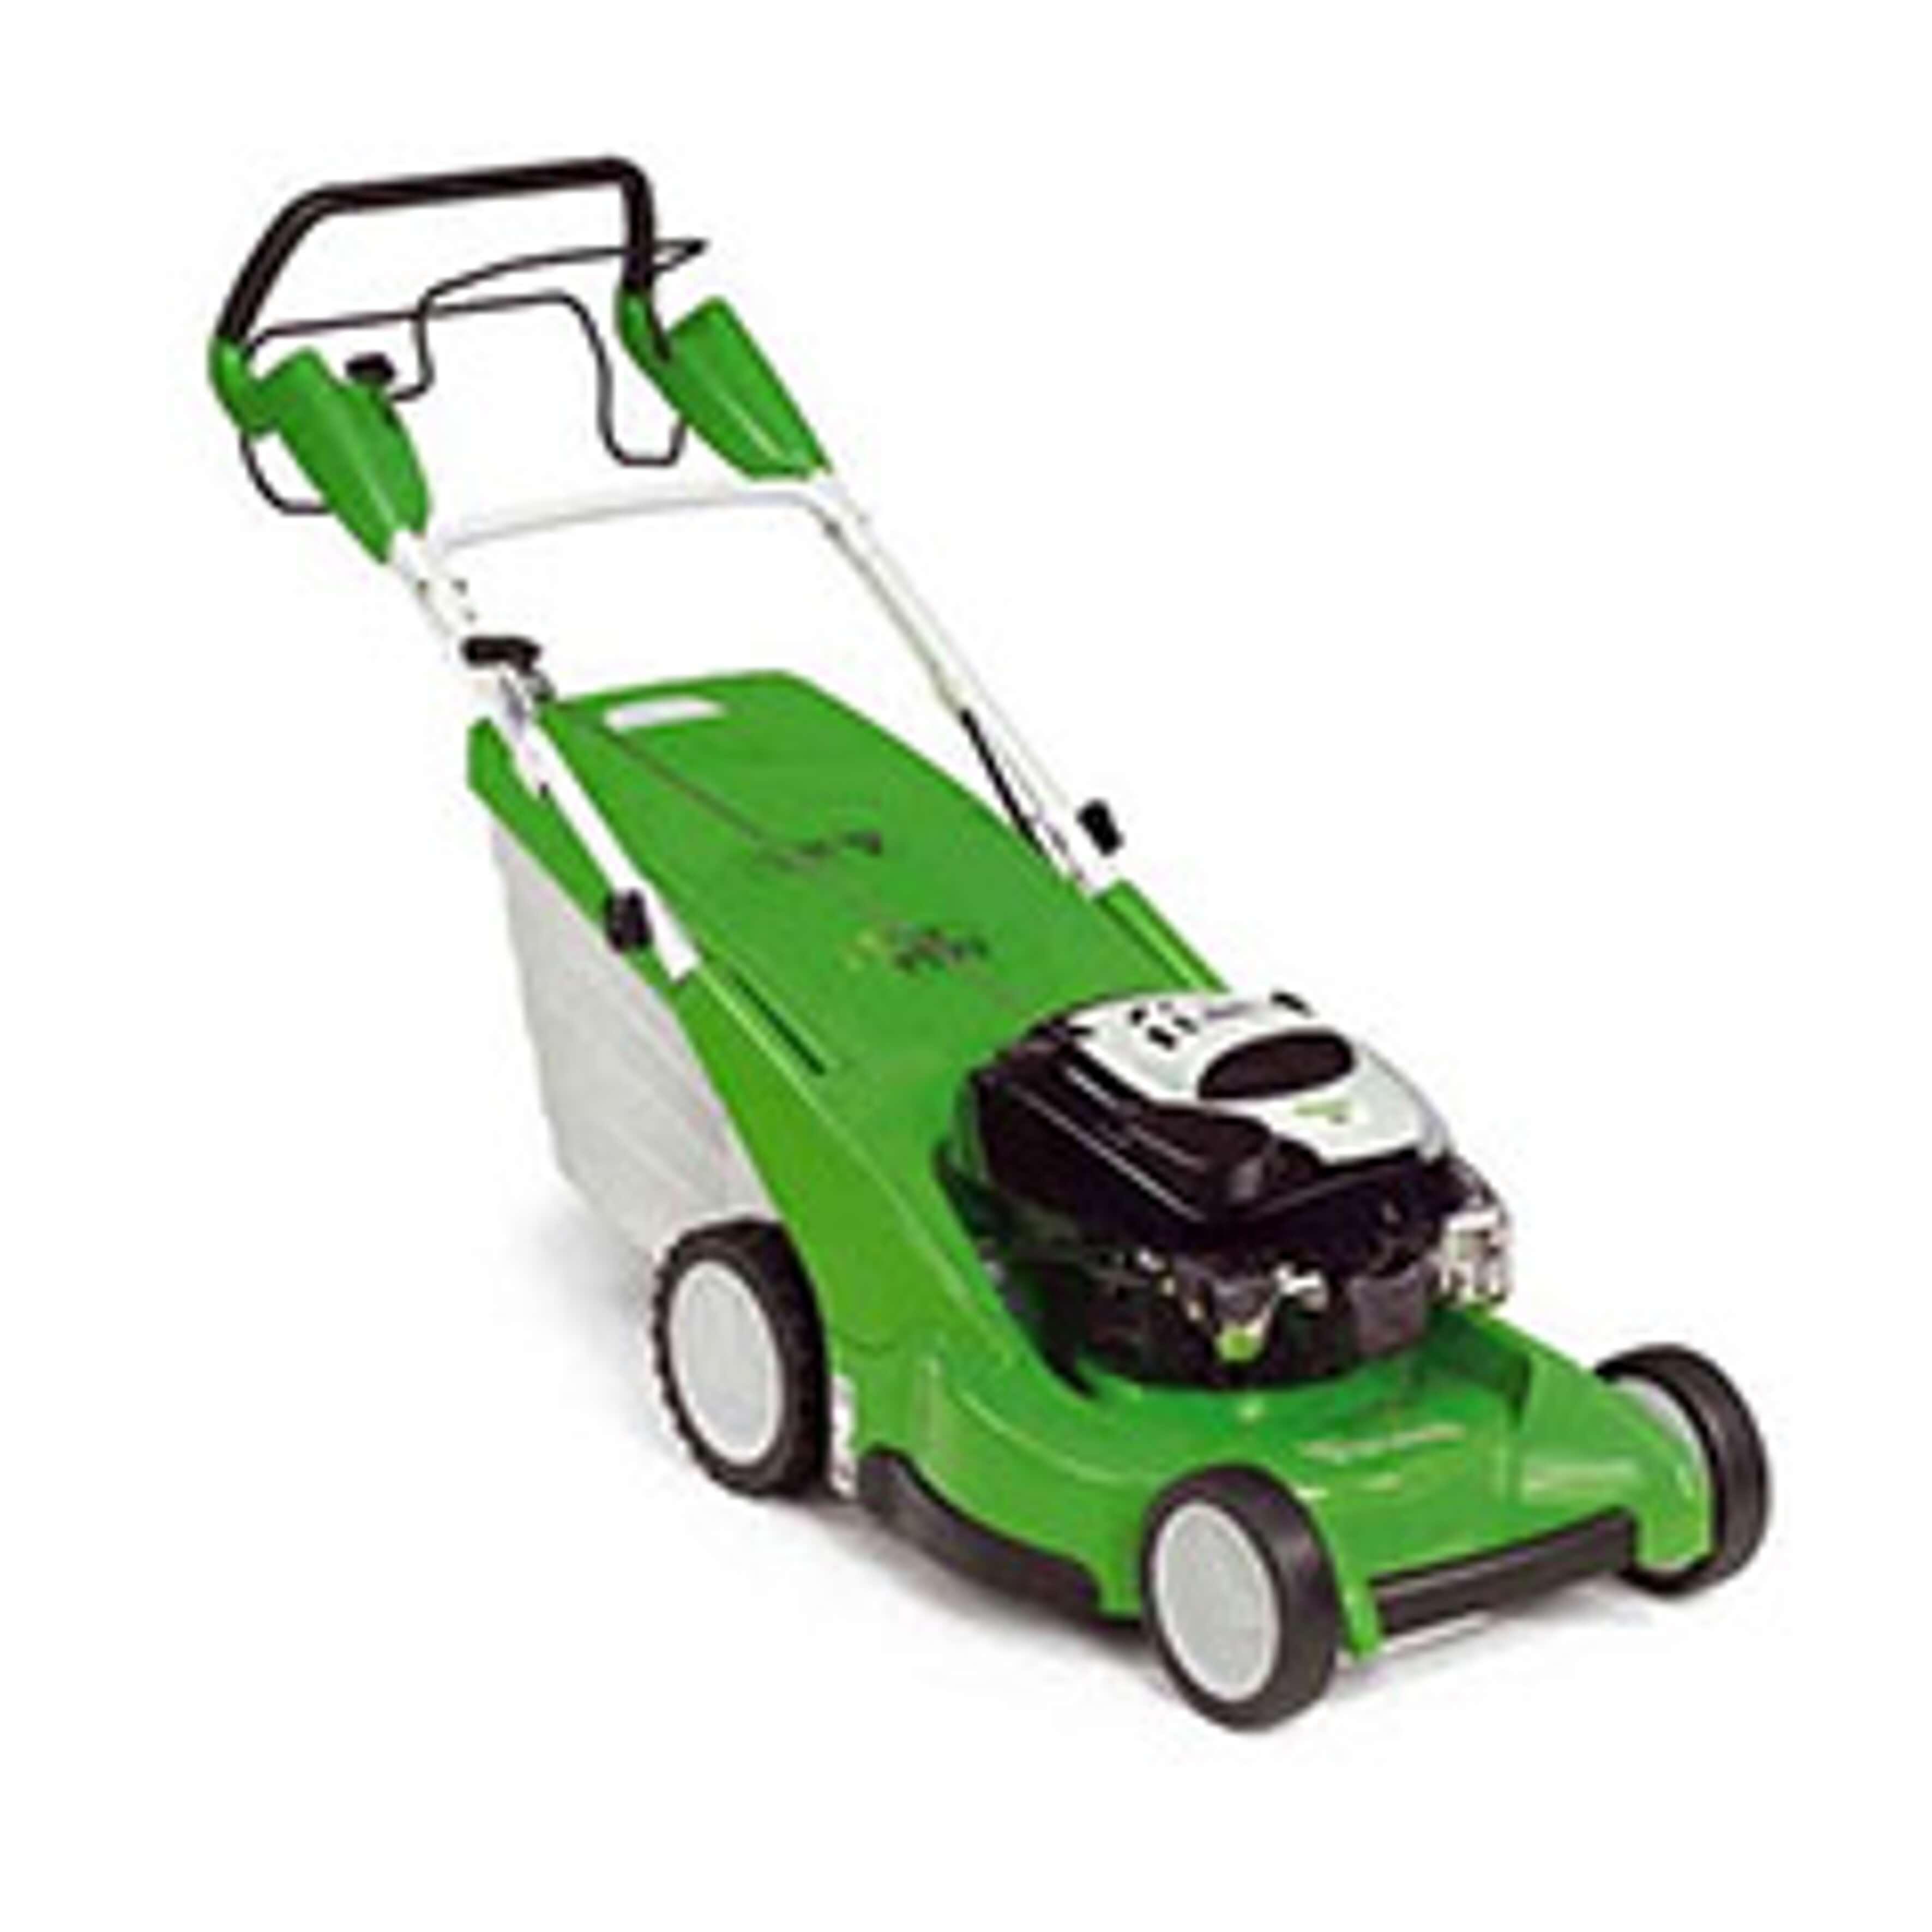 Viking MB 650.0 OS Petrol Lawn Mowers